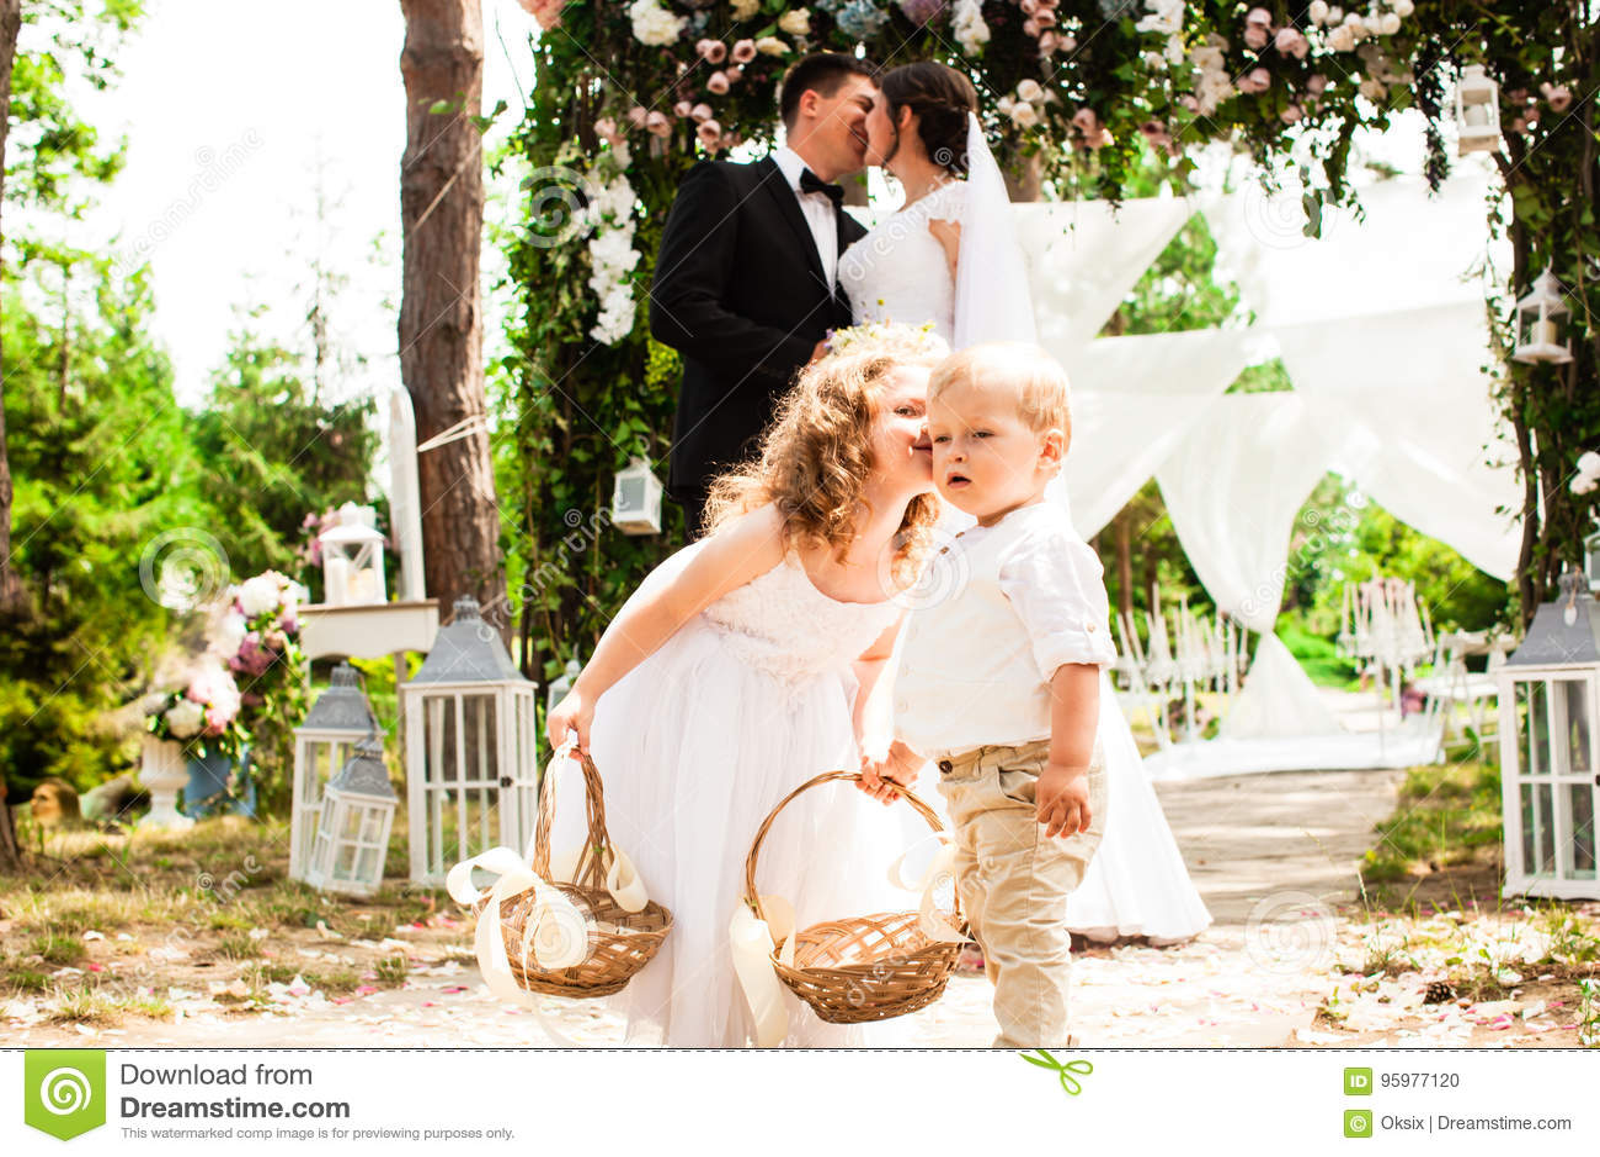 Baisers de mariée et de marié